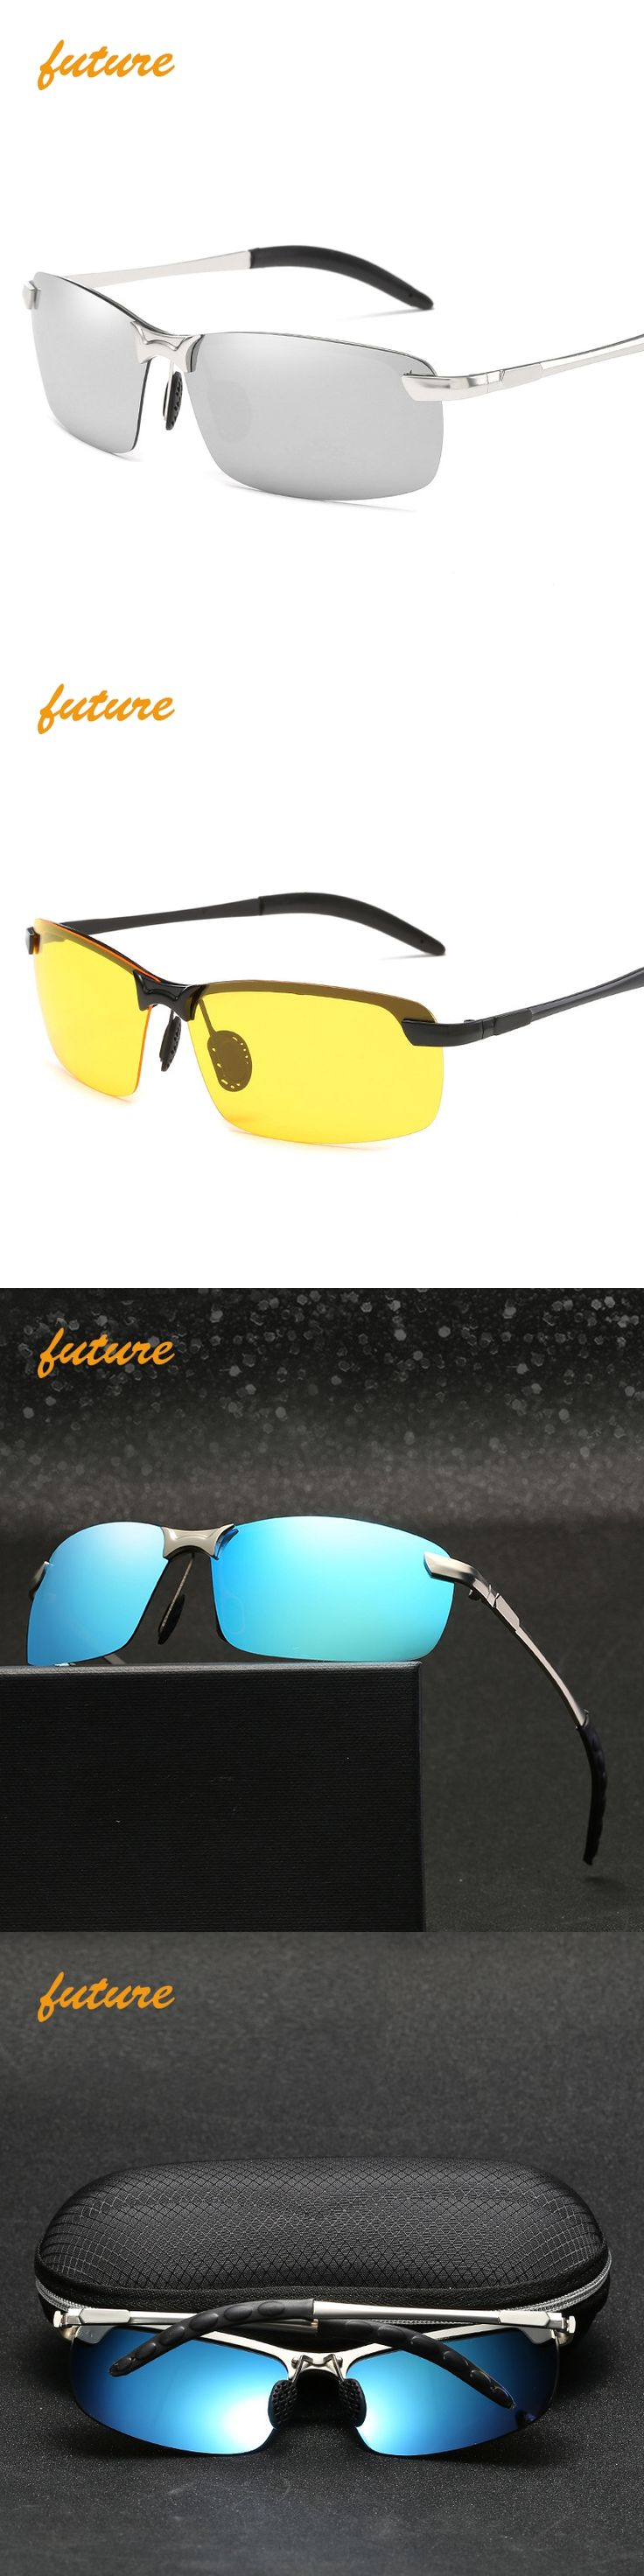 New Arrival Men's Glasses Car Drivers Night Vision Goggles Anti-Glare Polarizer Sunglasses Men Aluminum Magnesium Shades Brand